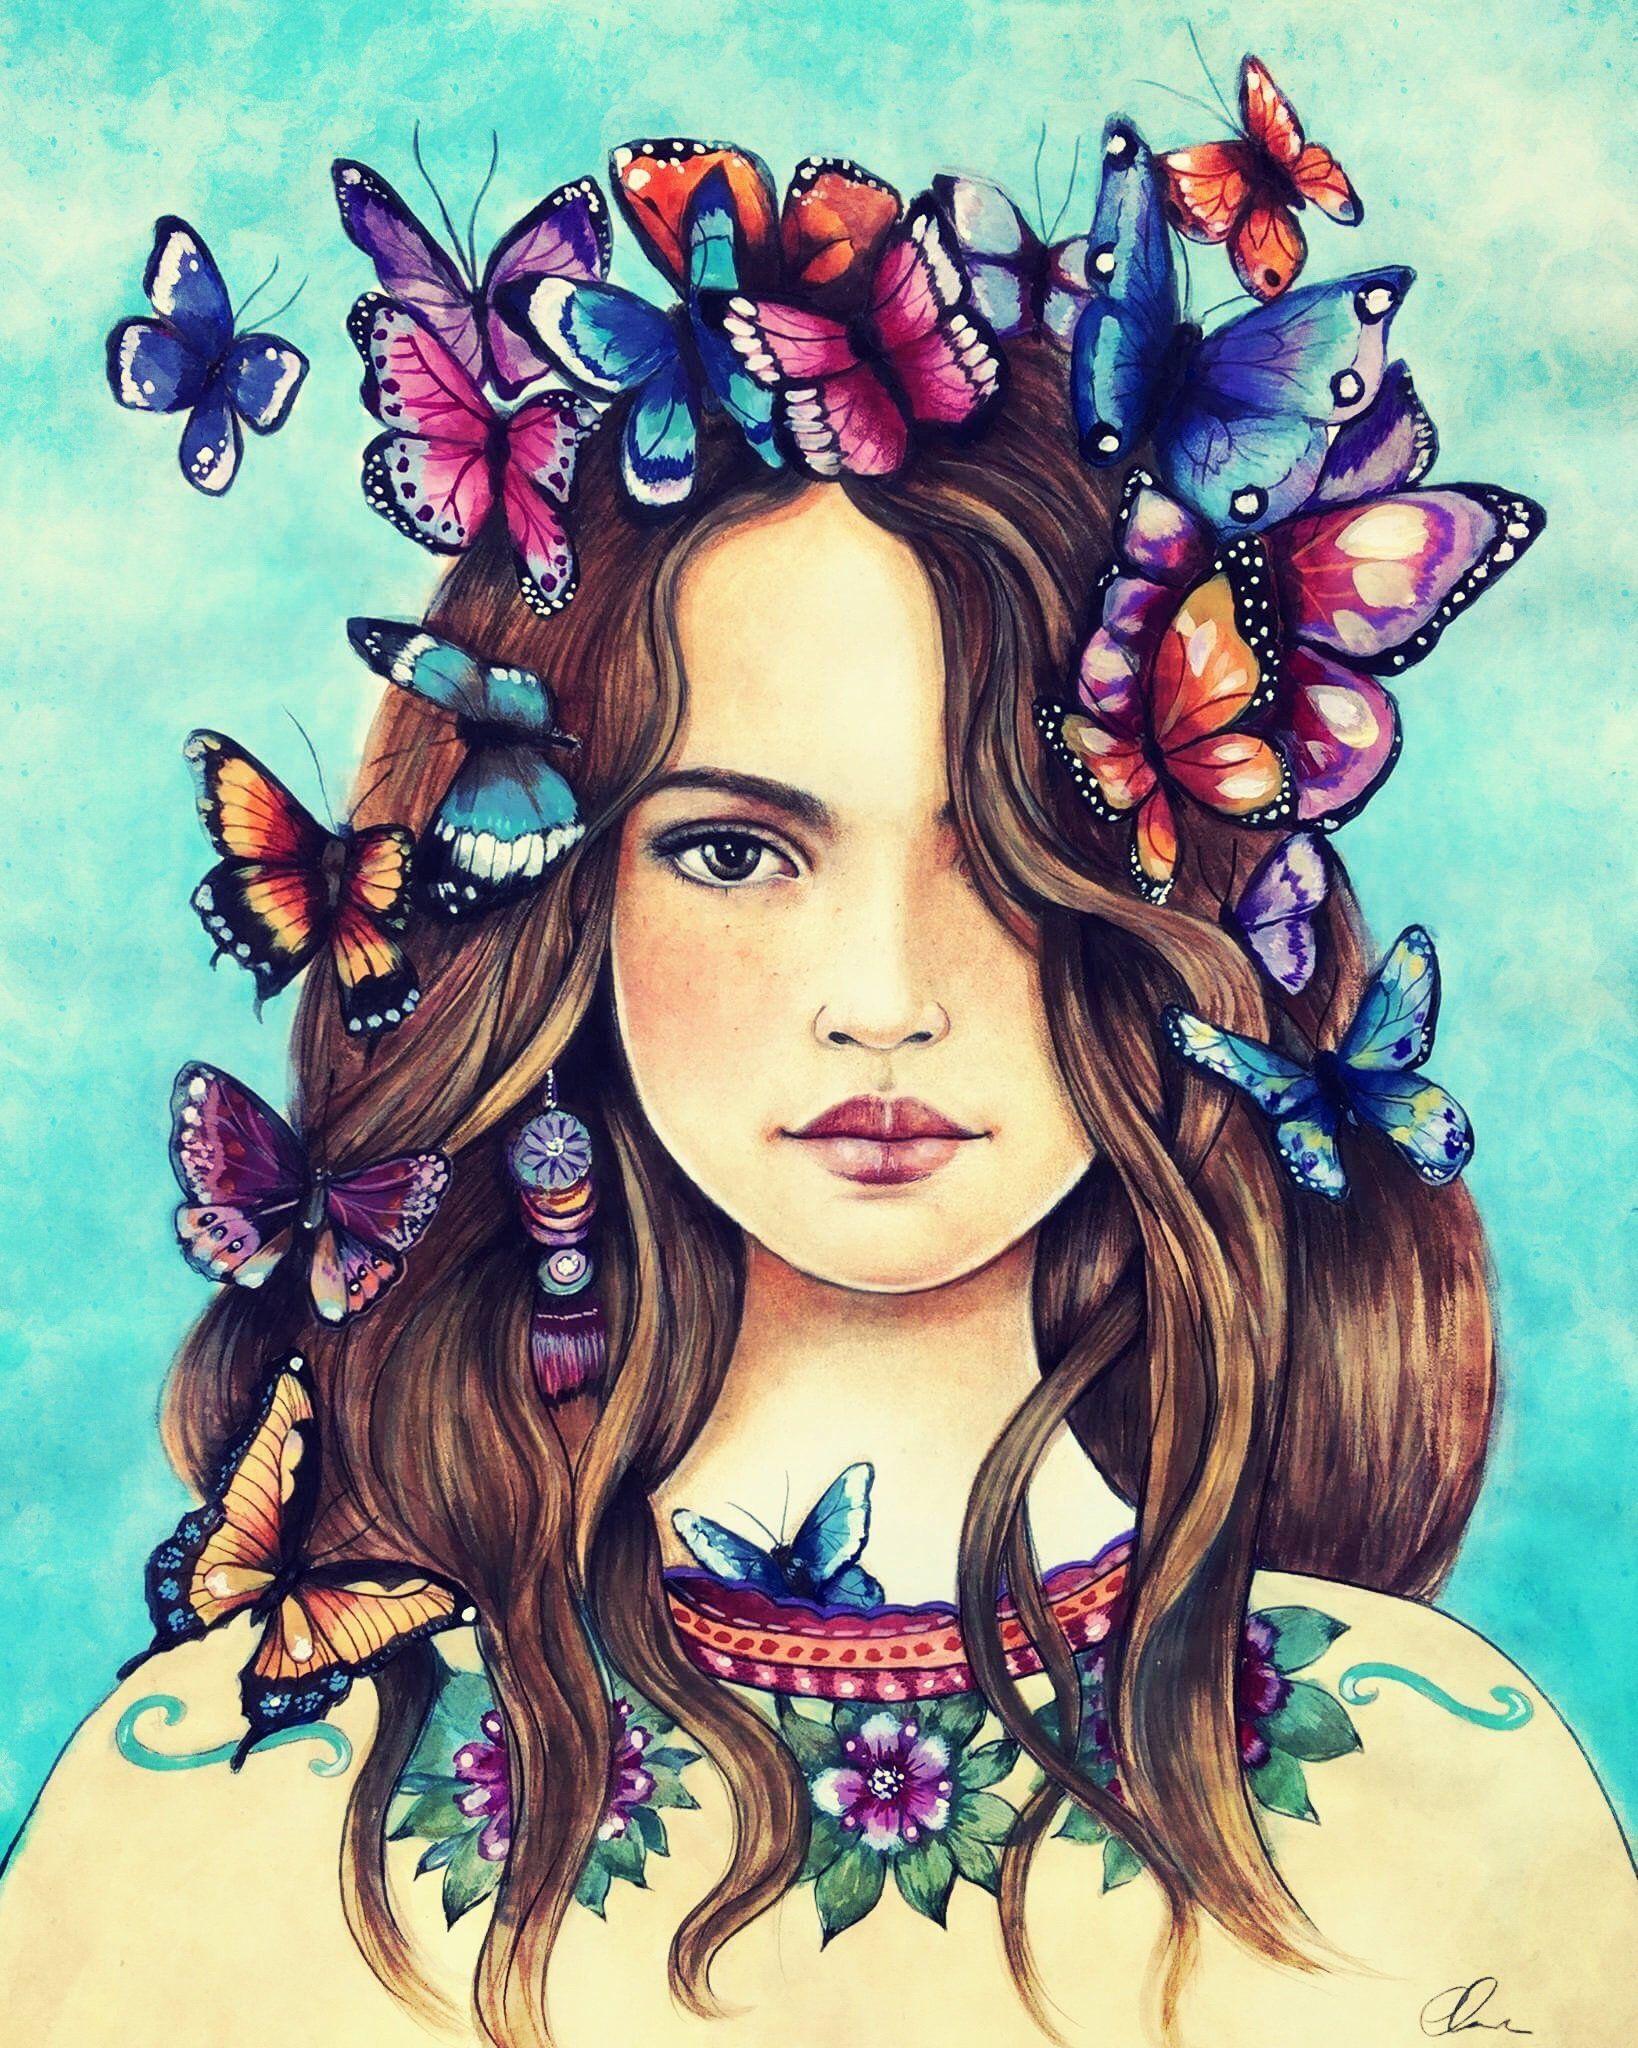 female empowerment, art print ,woman artwork, portrait artwork ,claudia tremblay Butterflies on her mind